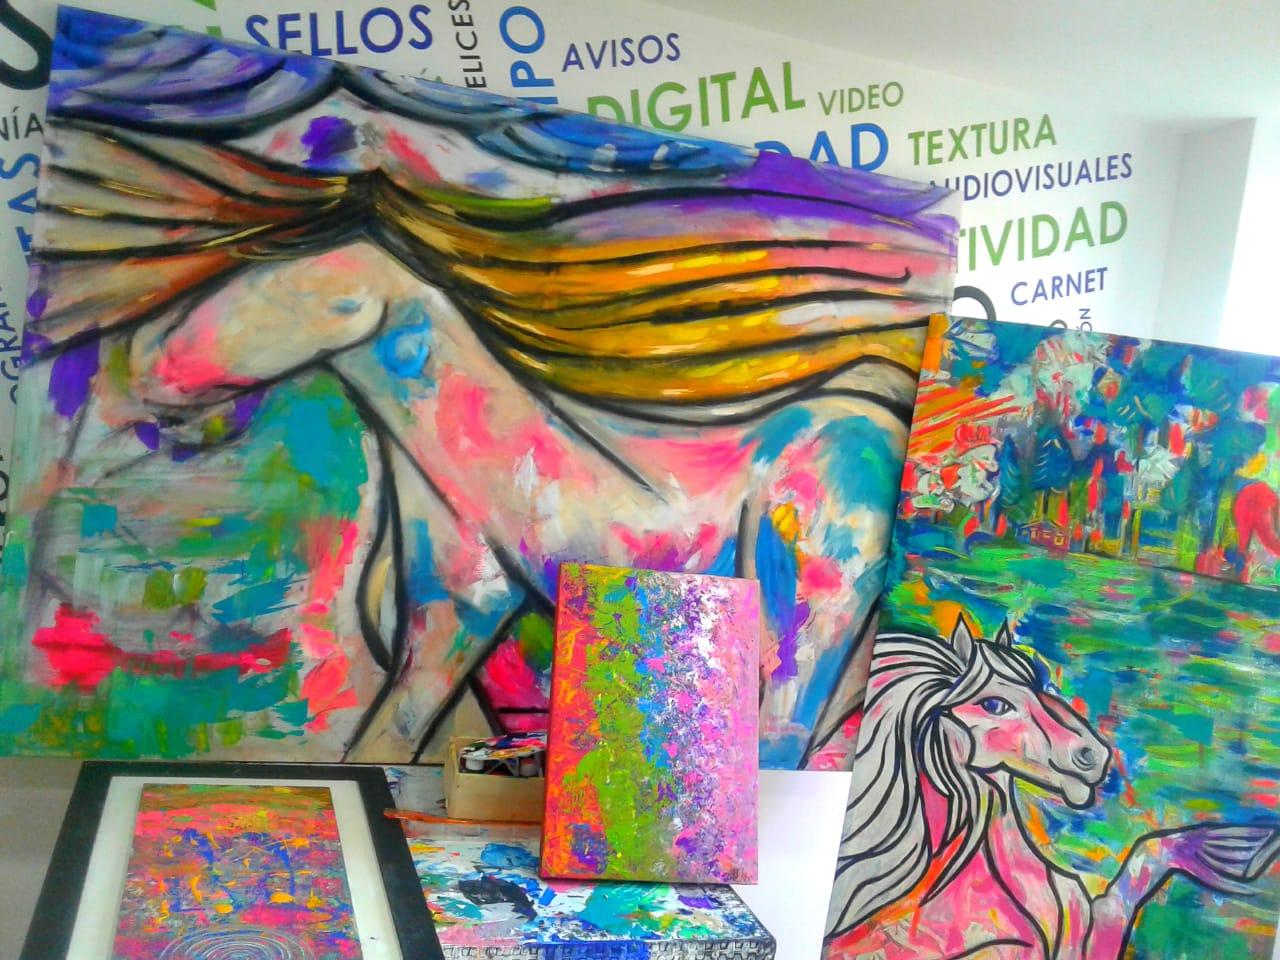 Talleres de obras de arte en medellin 2.